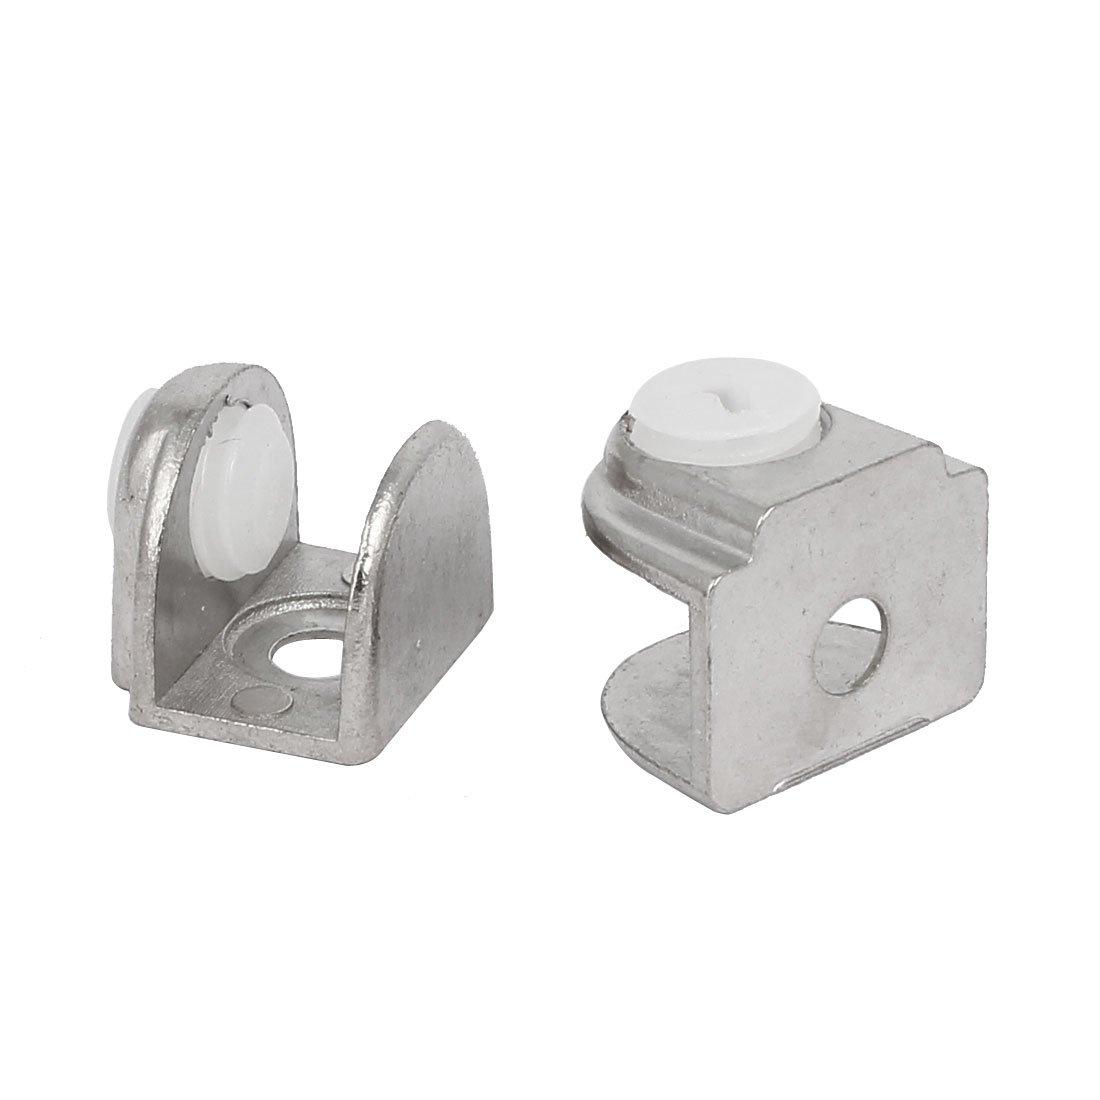 4mm-8mm dicke halbe Runde Glas Klemme Halbkreis Klammer Halter silbern de sourcingmap/® 20Stk